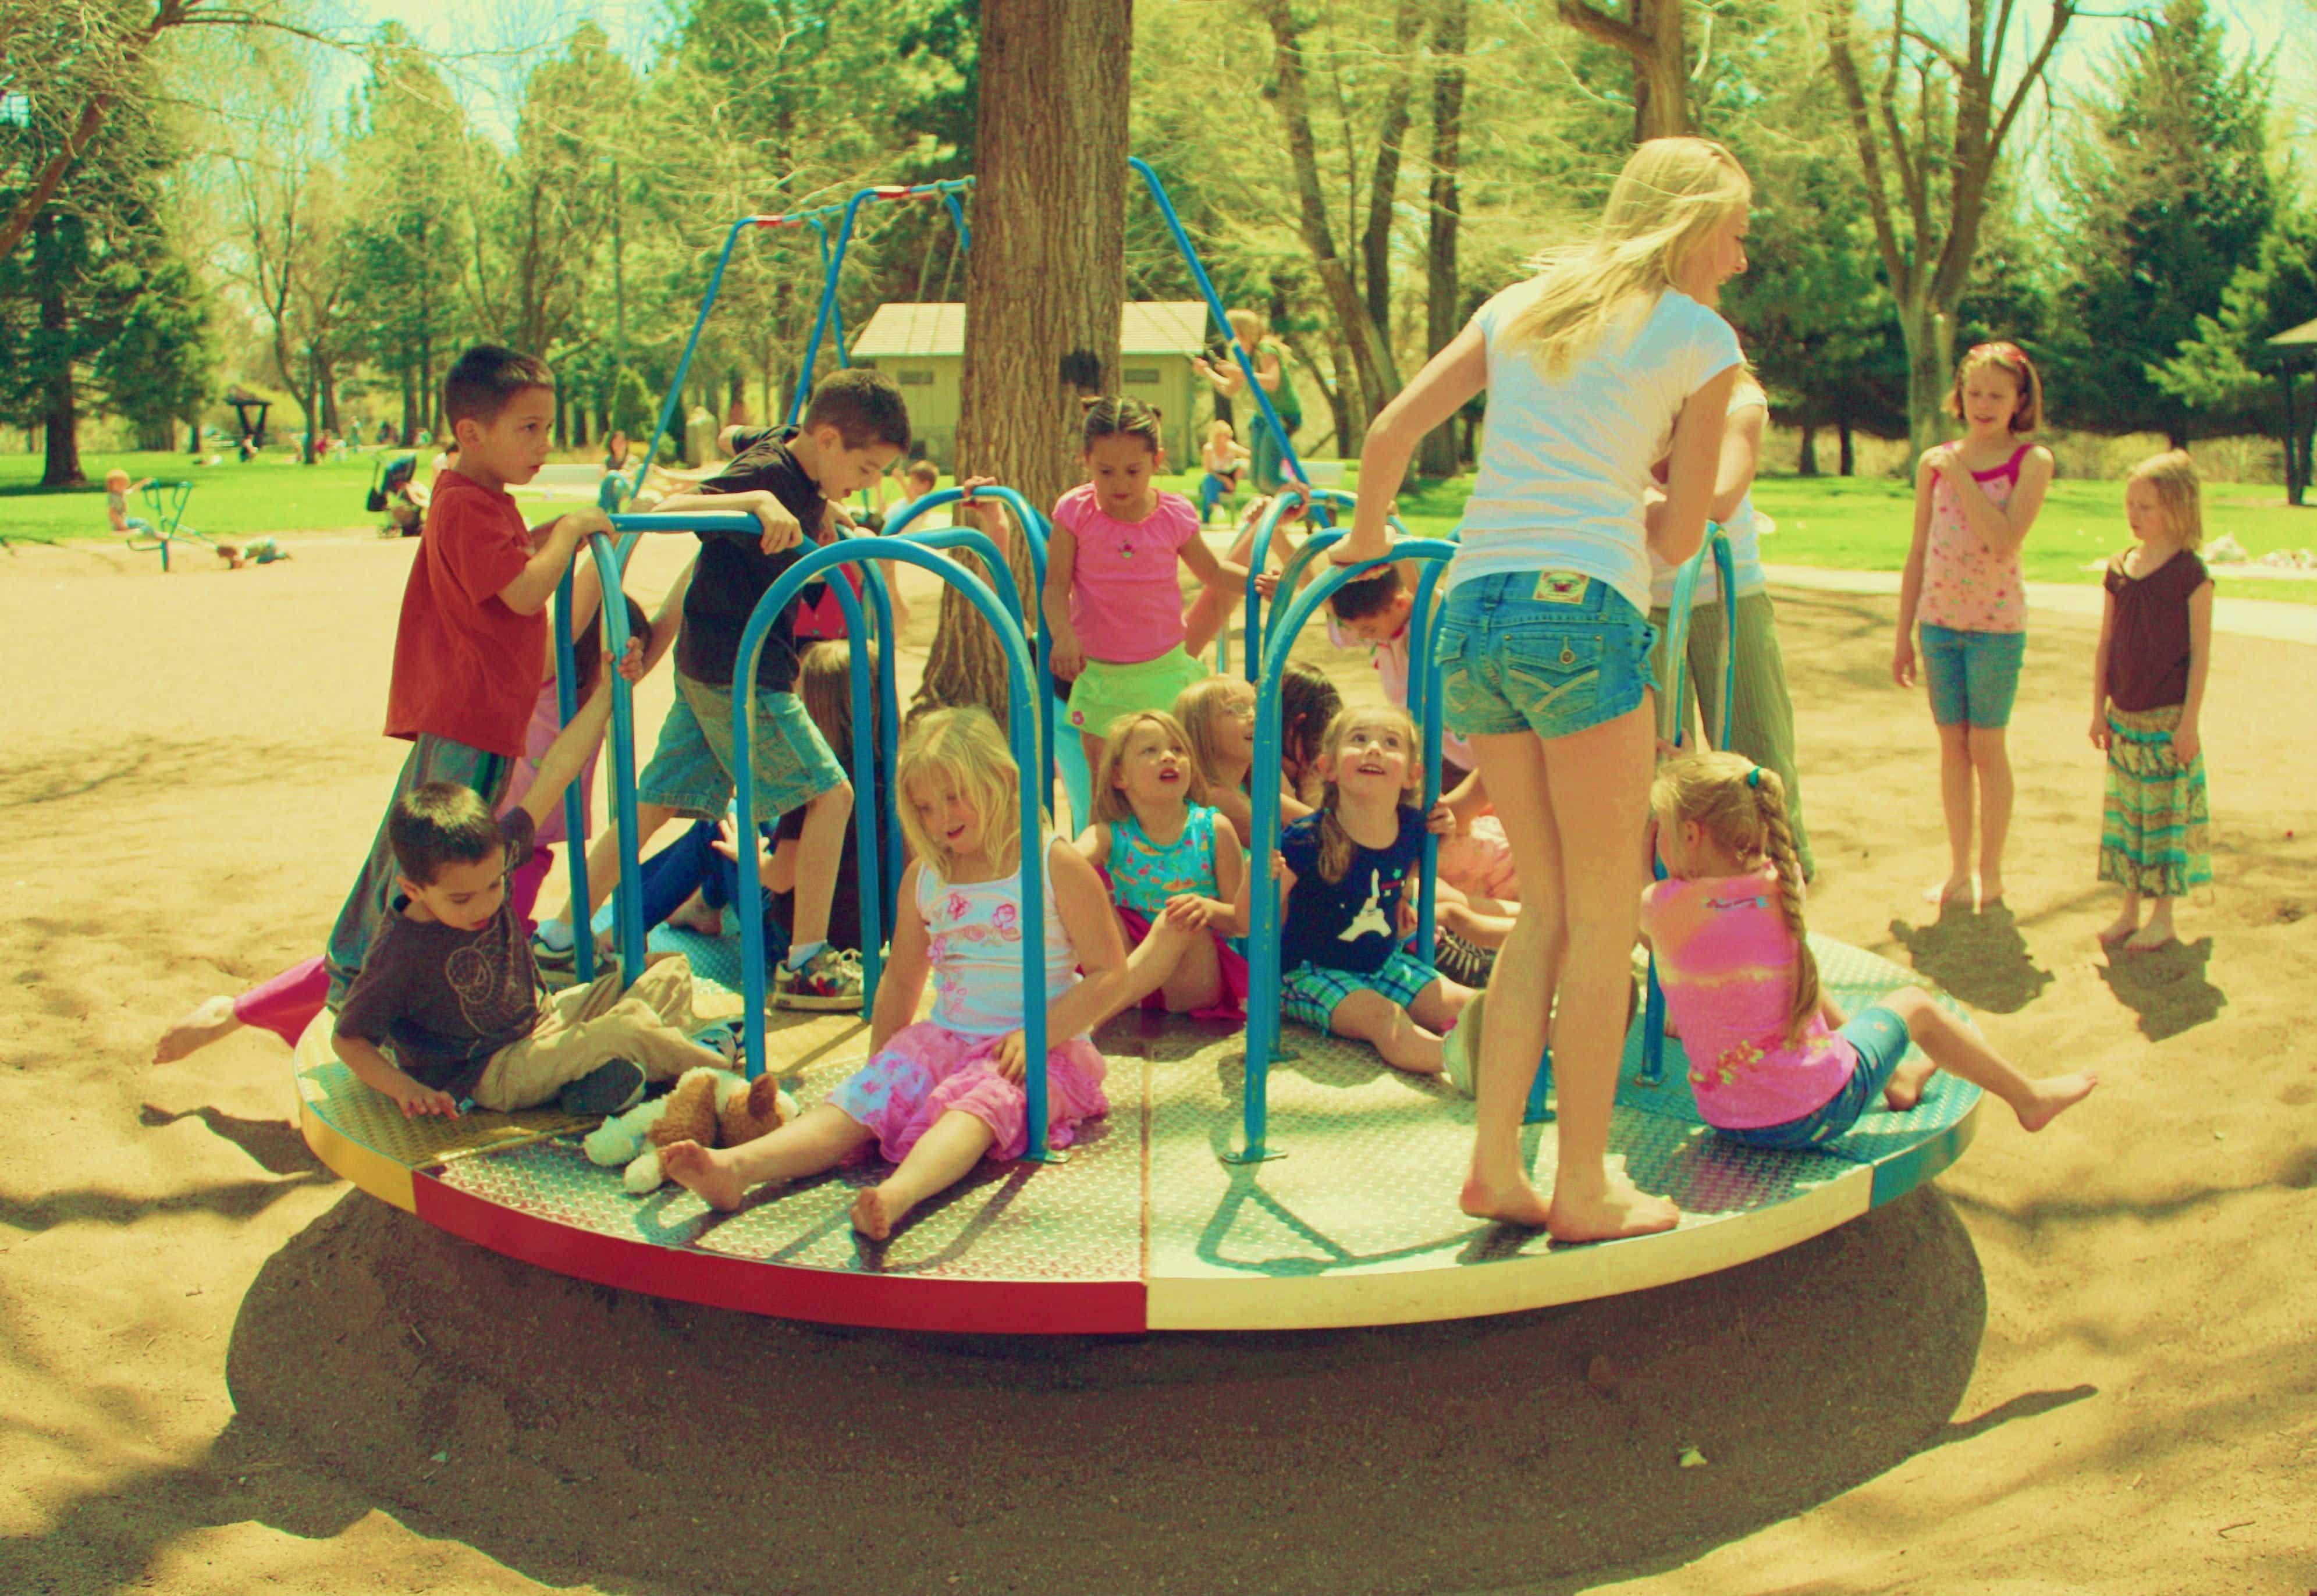 Children Playing on merry go round